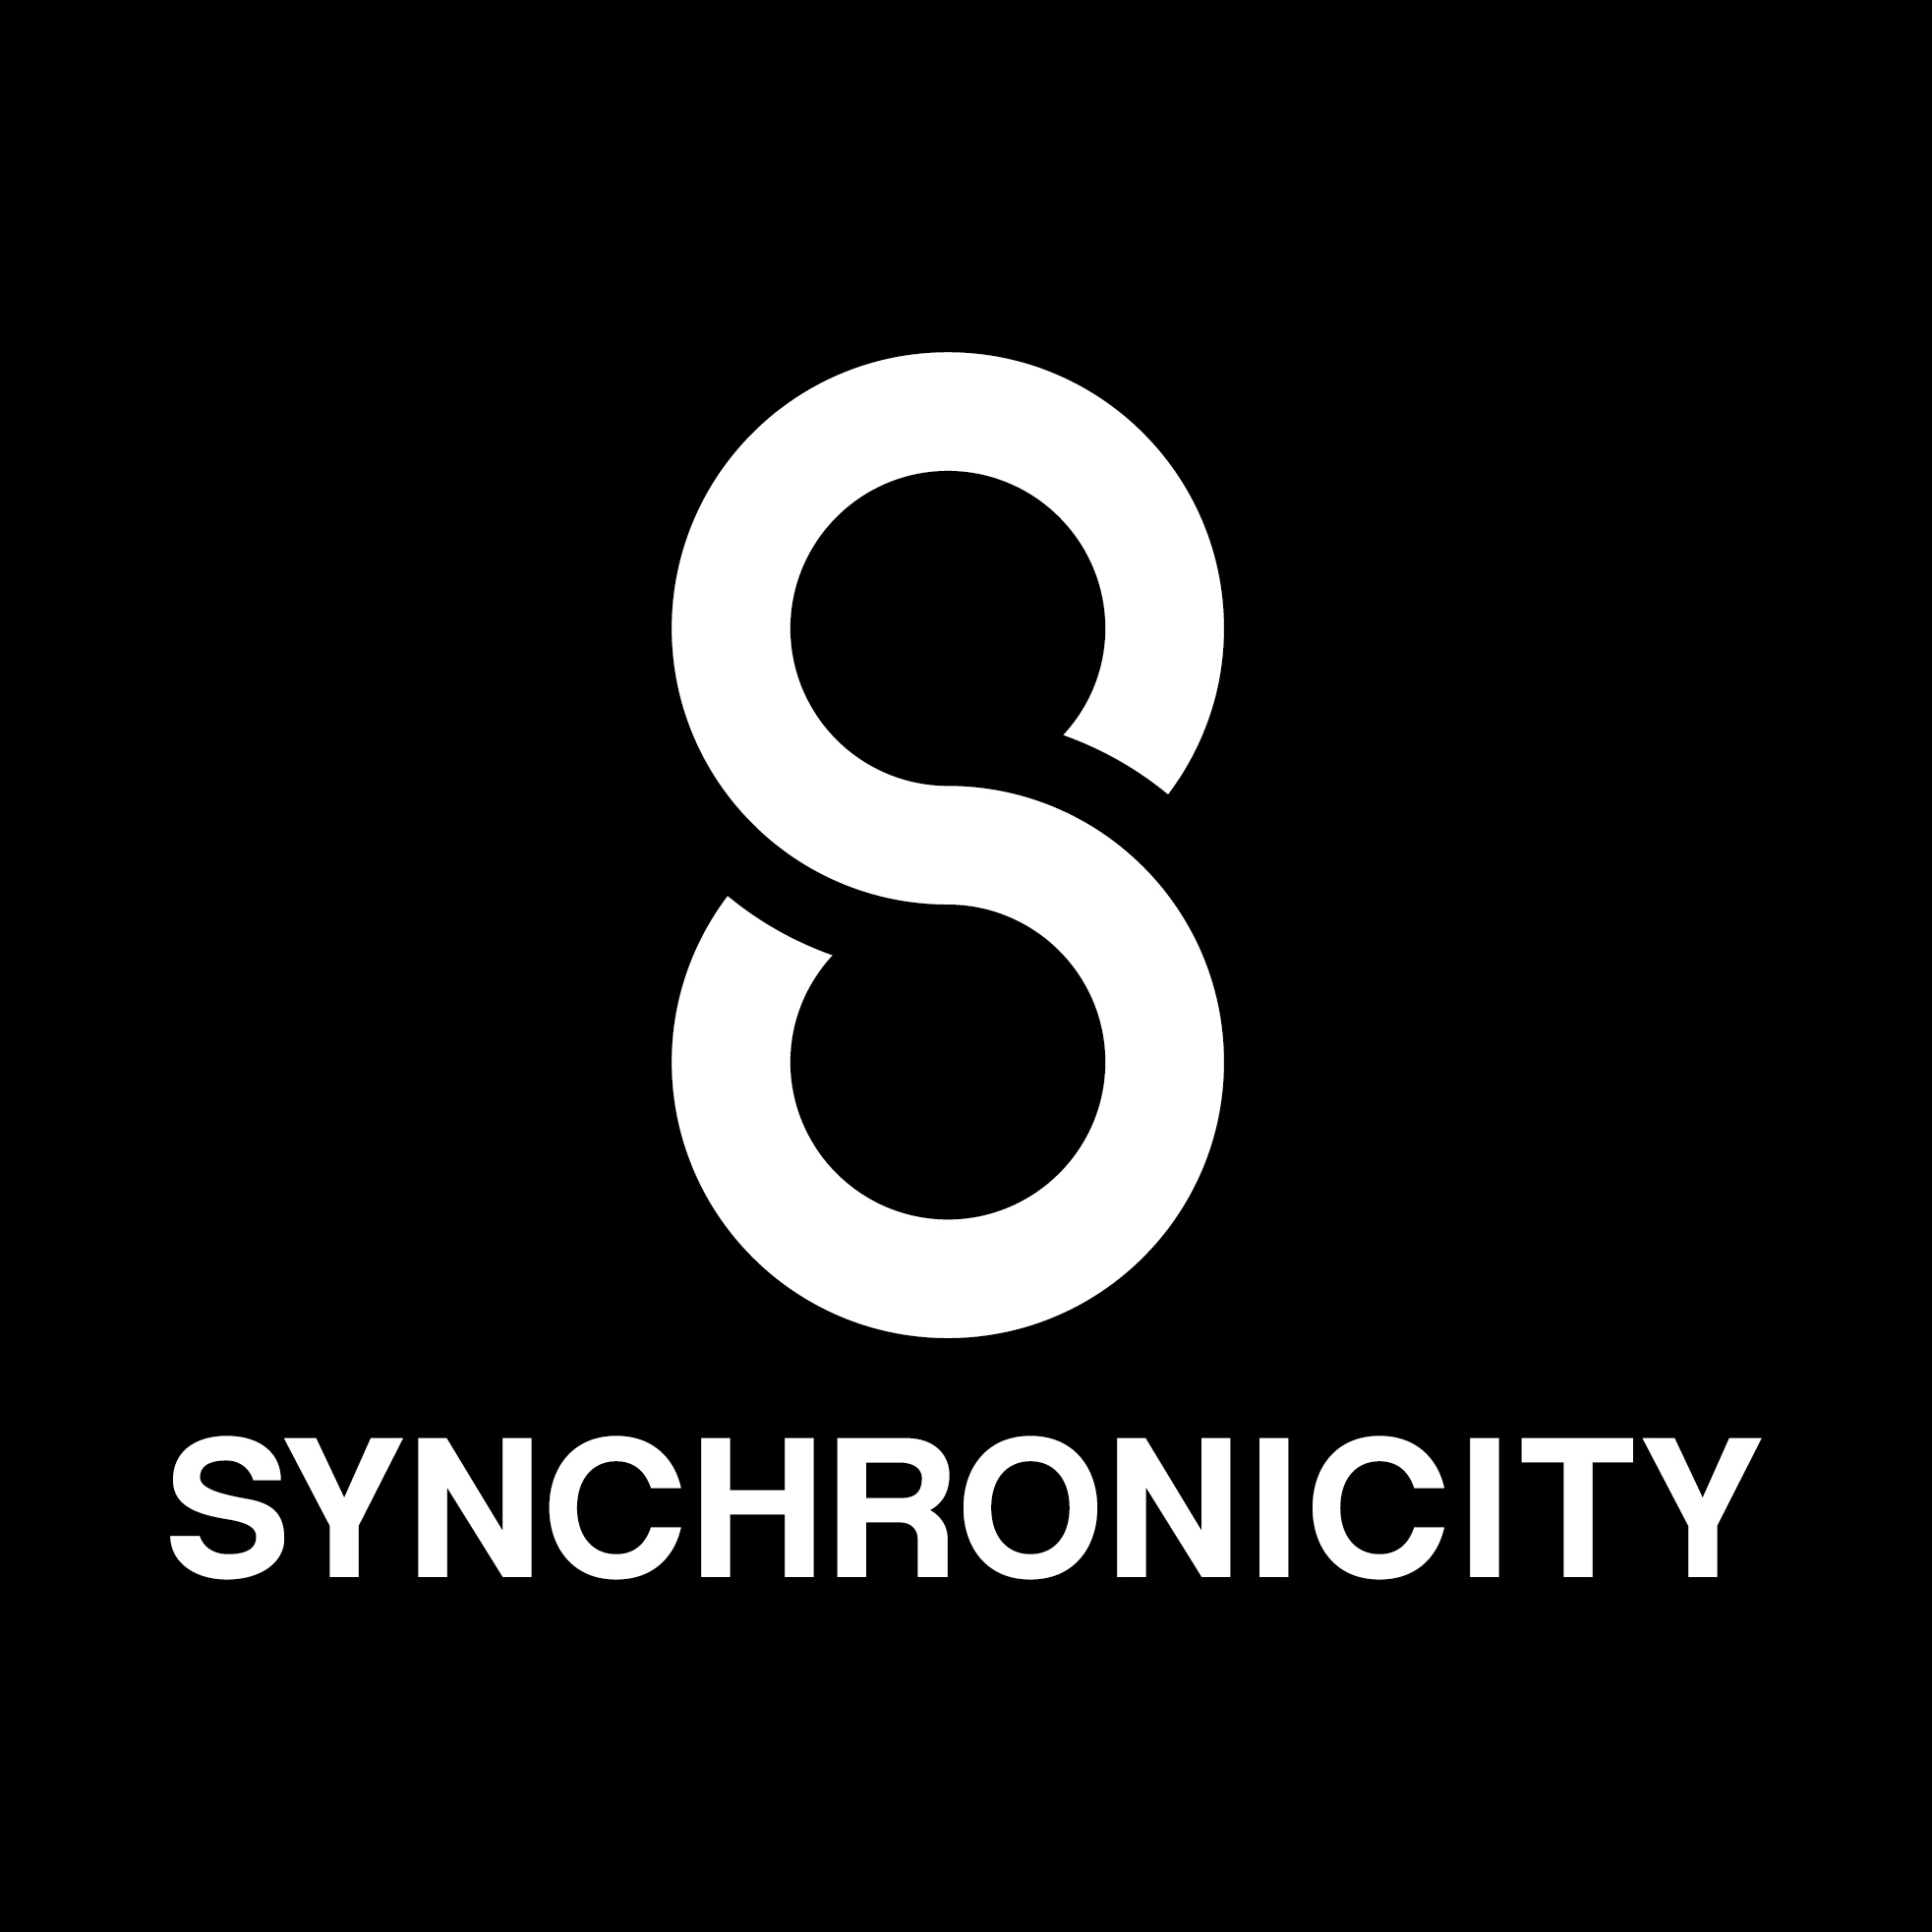 『SYNCHRONICITY'21』